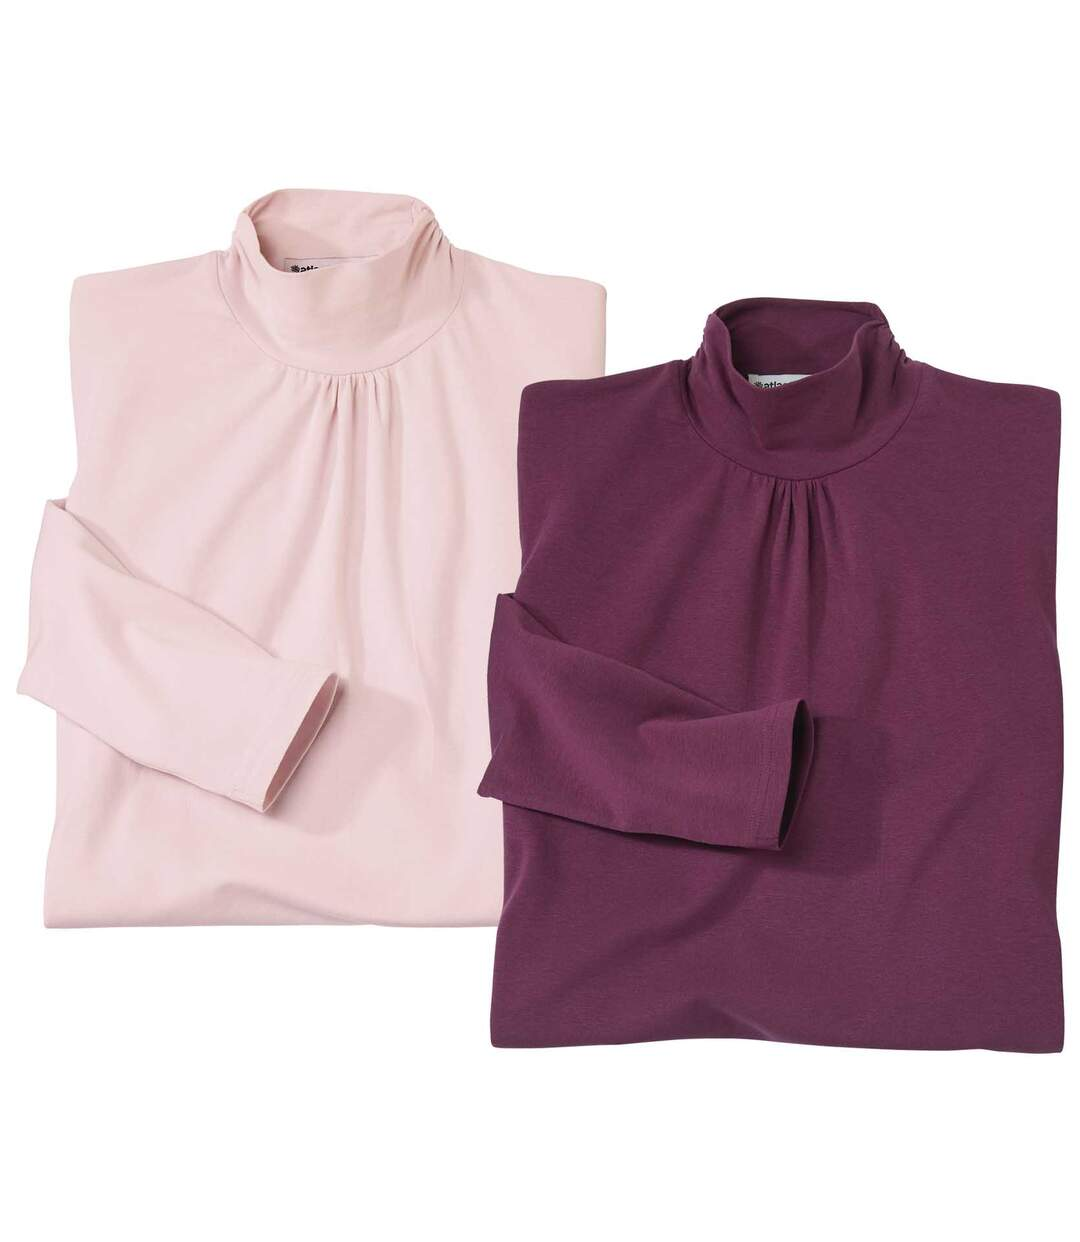 Pack of 2 Women's Turtle Neck Tops - Pink Plum